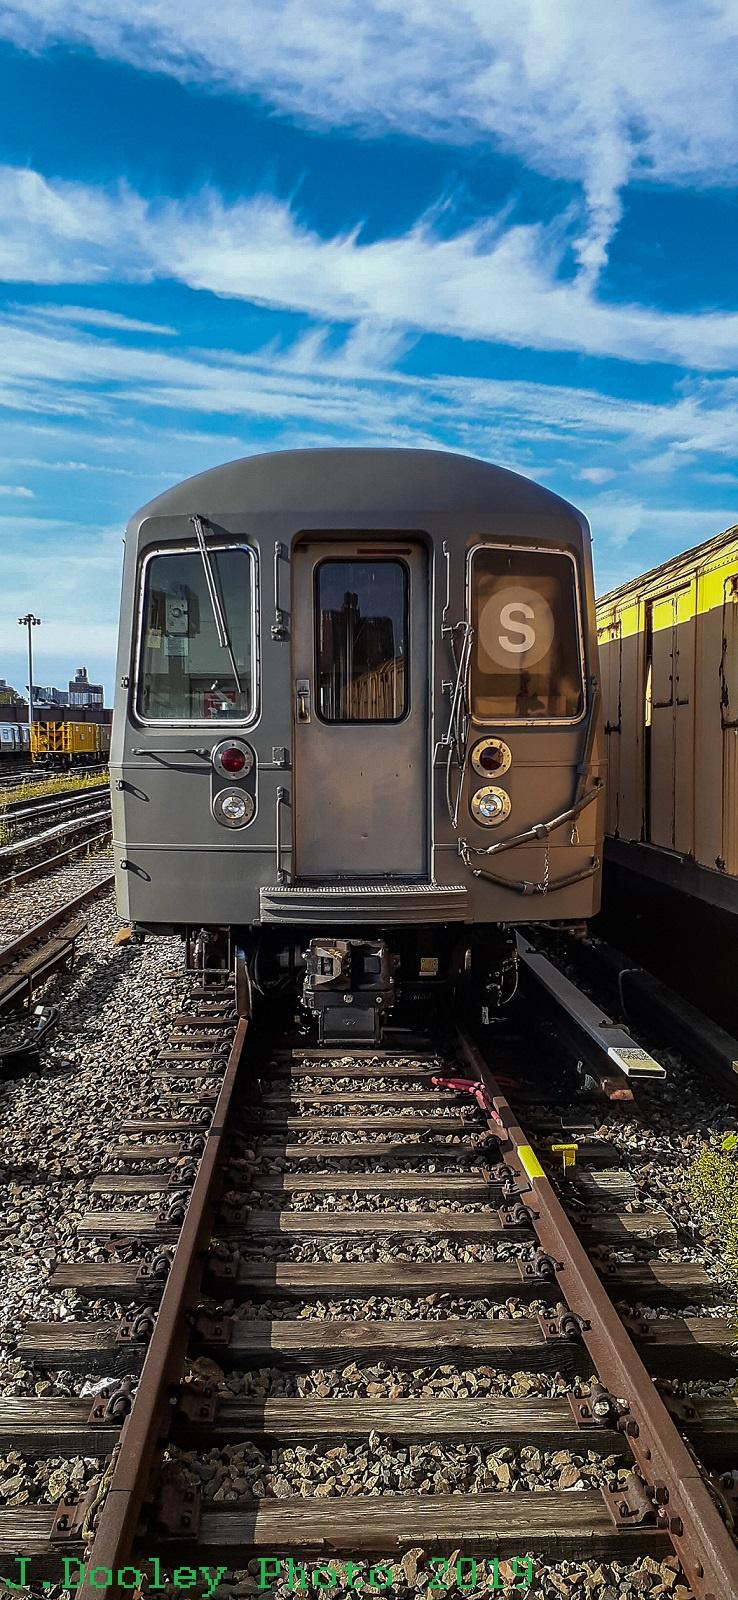 (574k, 738x1600)<br><b>Country:</b> United States<br><b>City:</b> New York<br><b>System:</b> New York City Transit<br><b>Location:</b> Coney Island Yard<br><b>Car:</b> R-68 (Westinghouse-Amrail, 1986-1988) 2924 <br><b>Photo by:</b> John Dooley<br><b>Date:</b> 8/31/2019<br><b>Viewed (this week/total):</b> 0 / 255